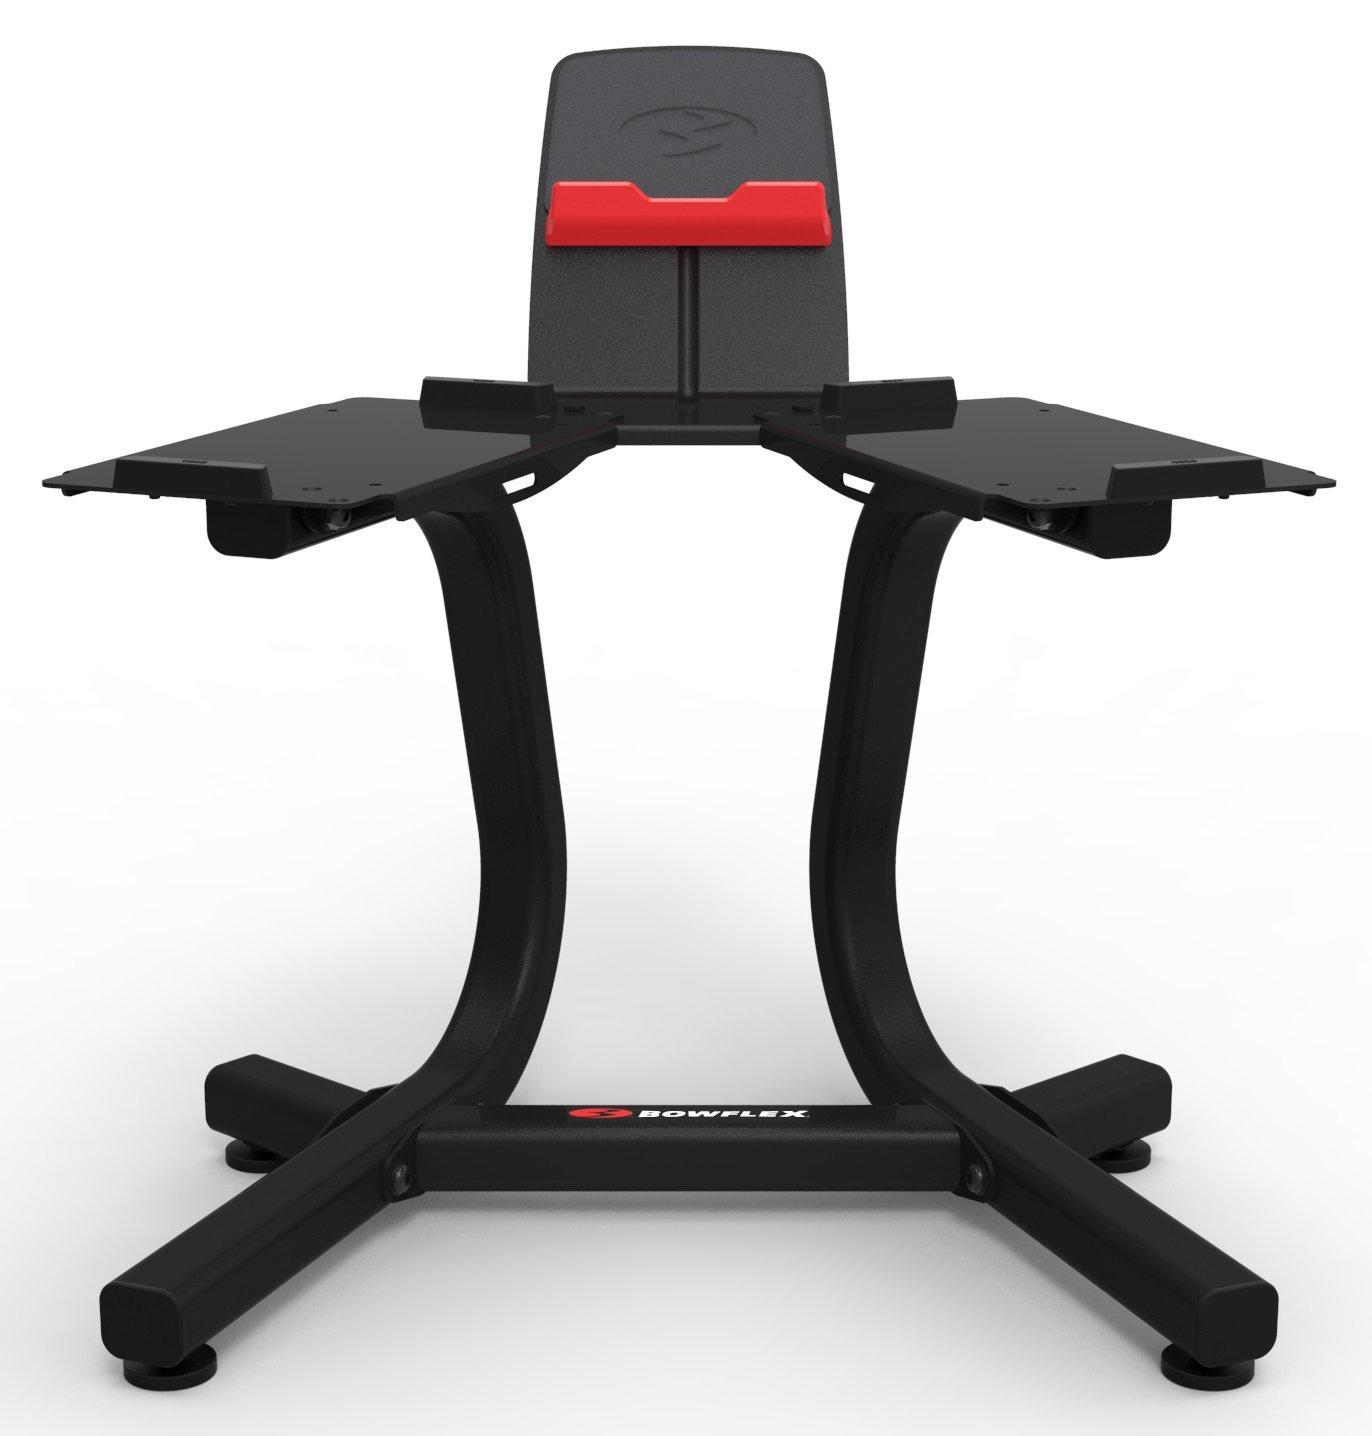 Bowflex SelectTech Dumbbell Stand (MY17) by Bowflex